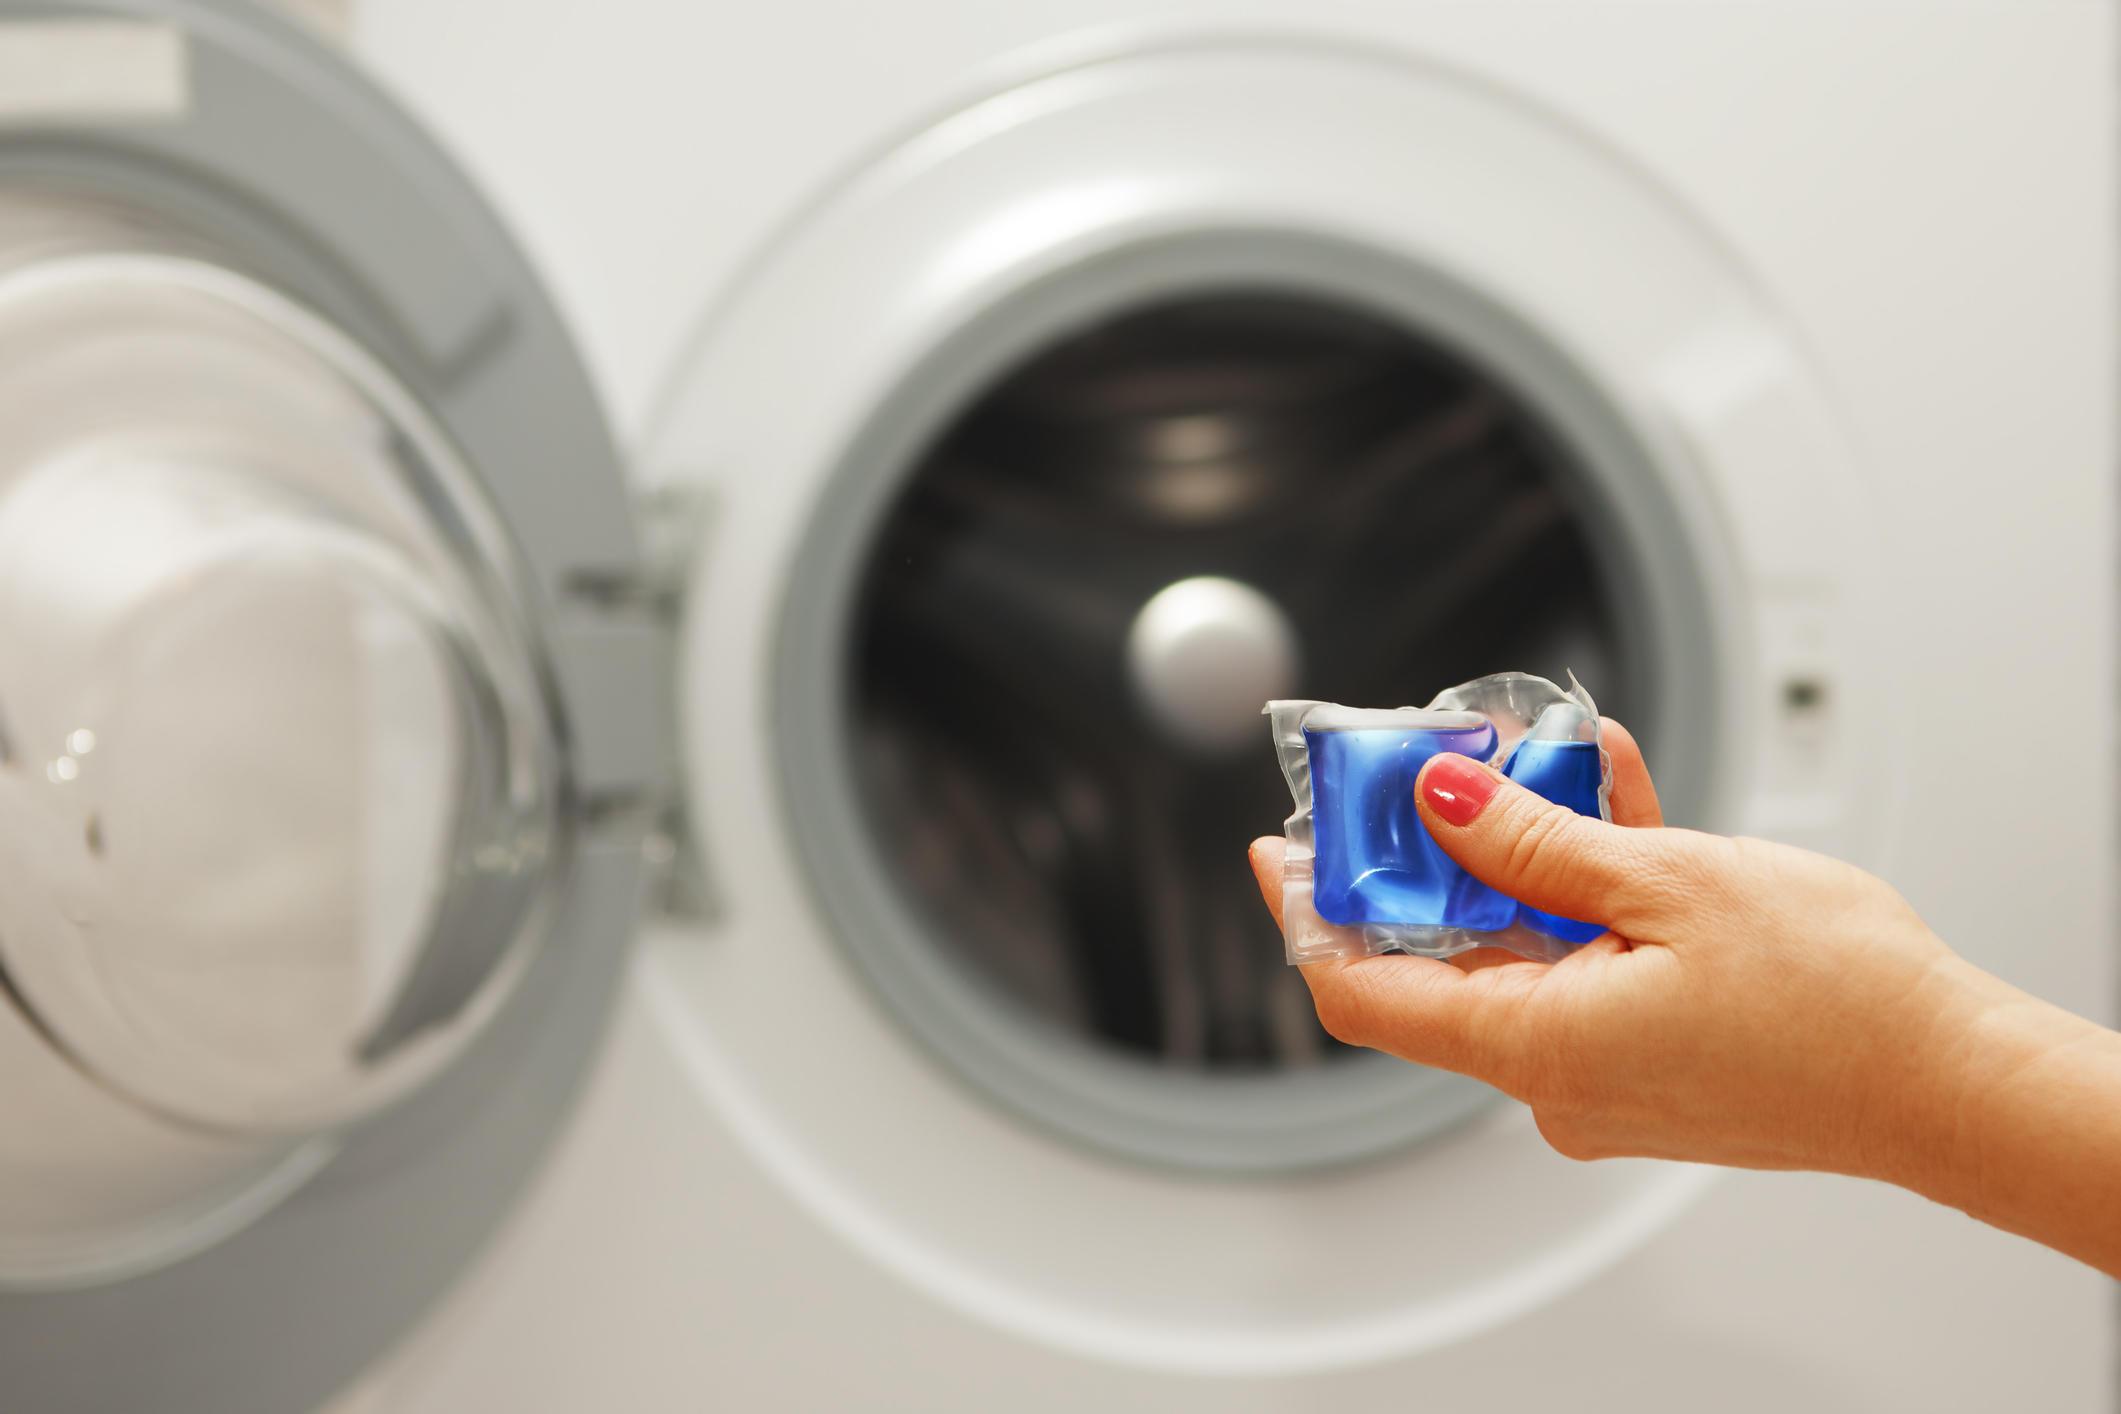 gel caps in hand for washing mashine, liquid coloured detergent